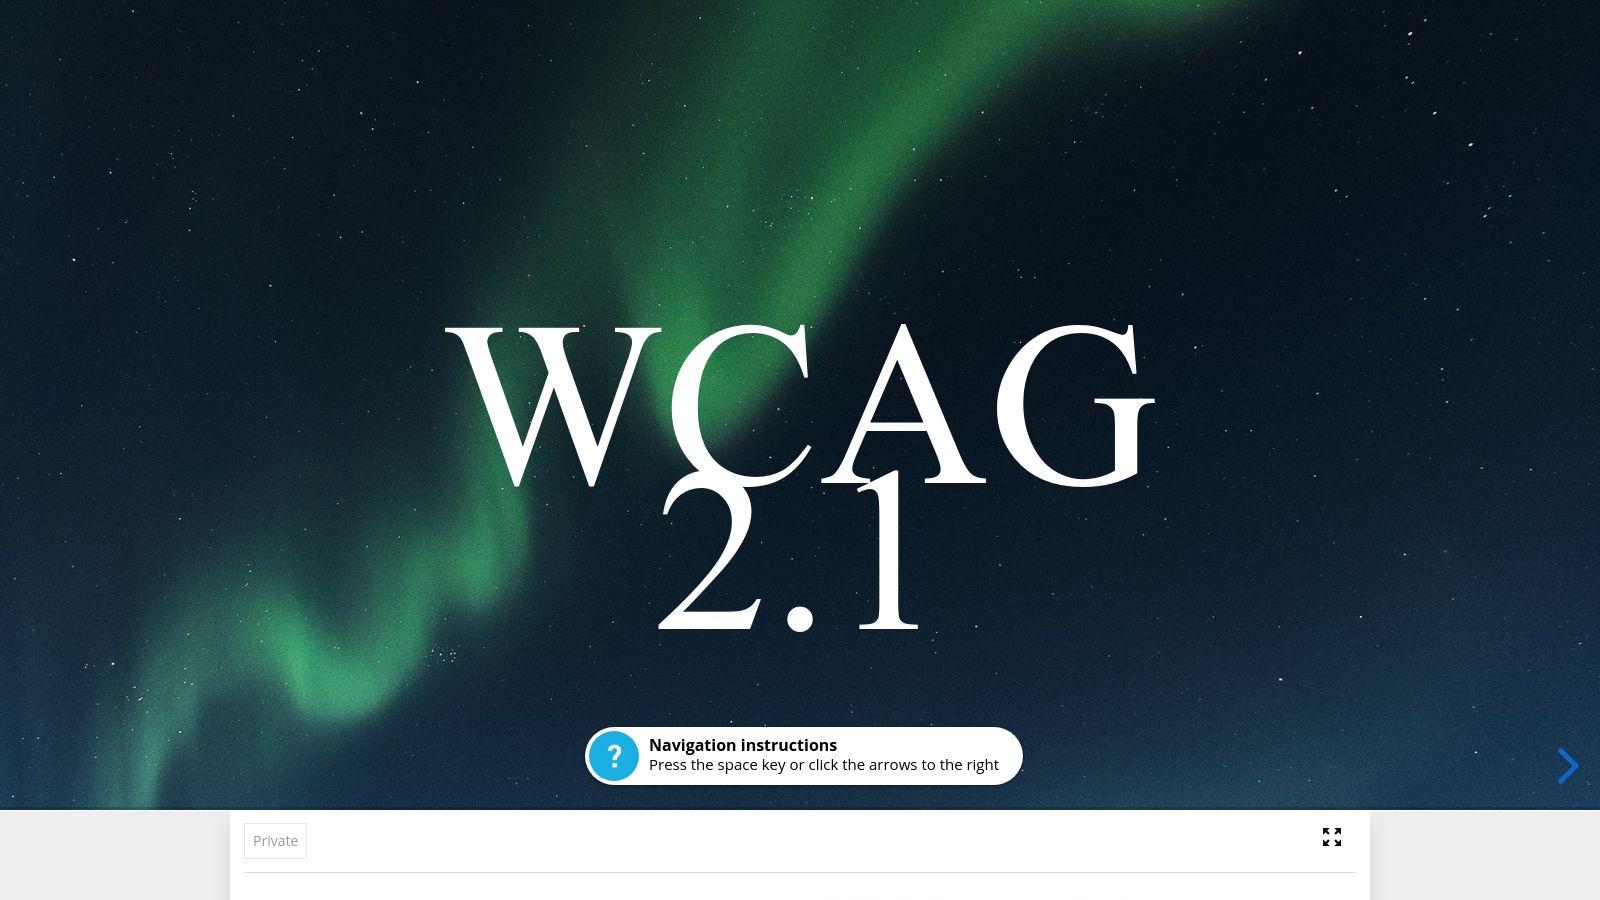 WCAG 2.1 – Was ist neu?